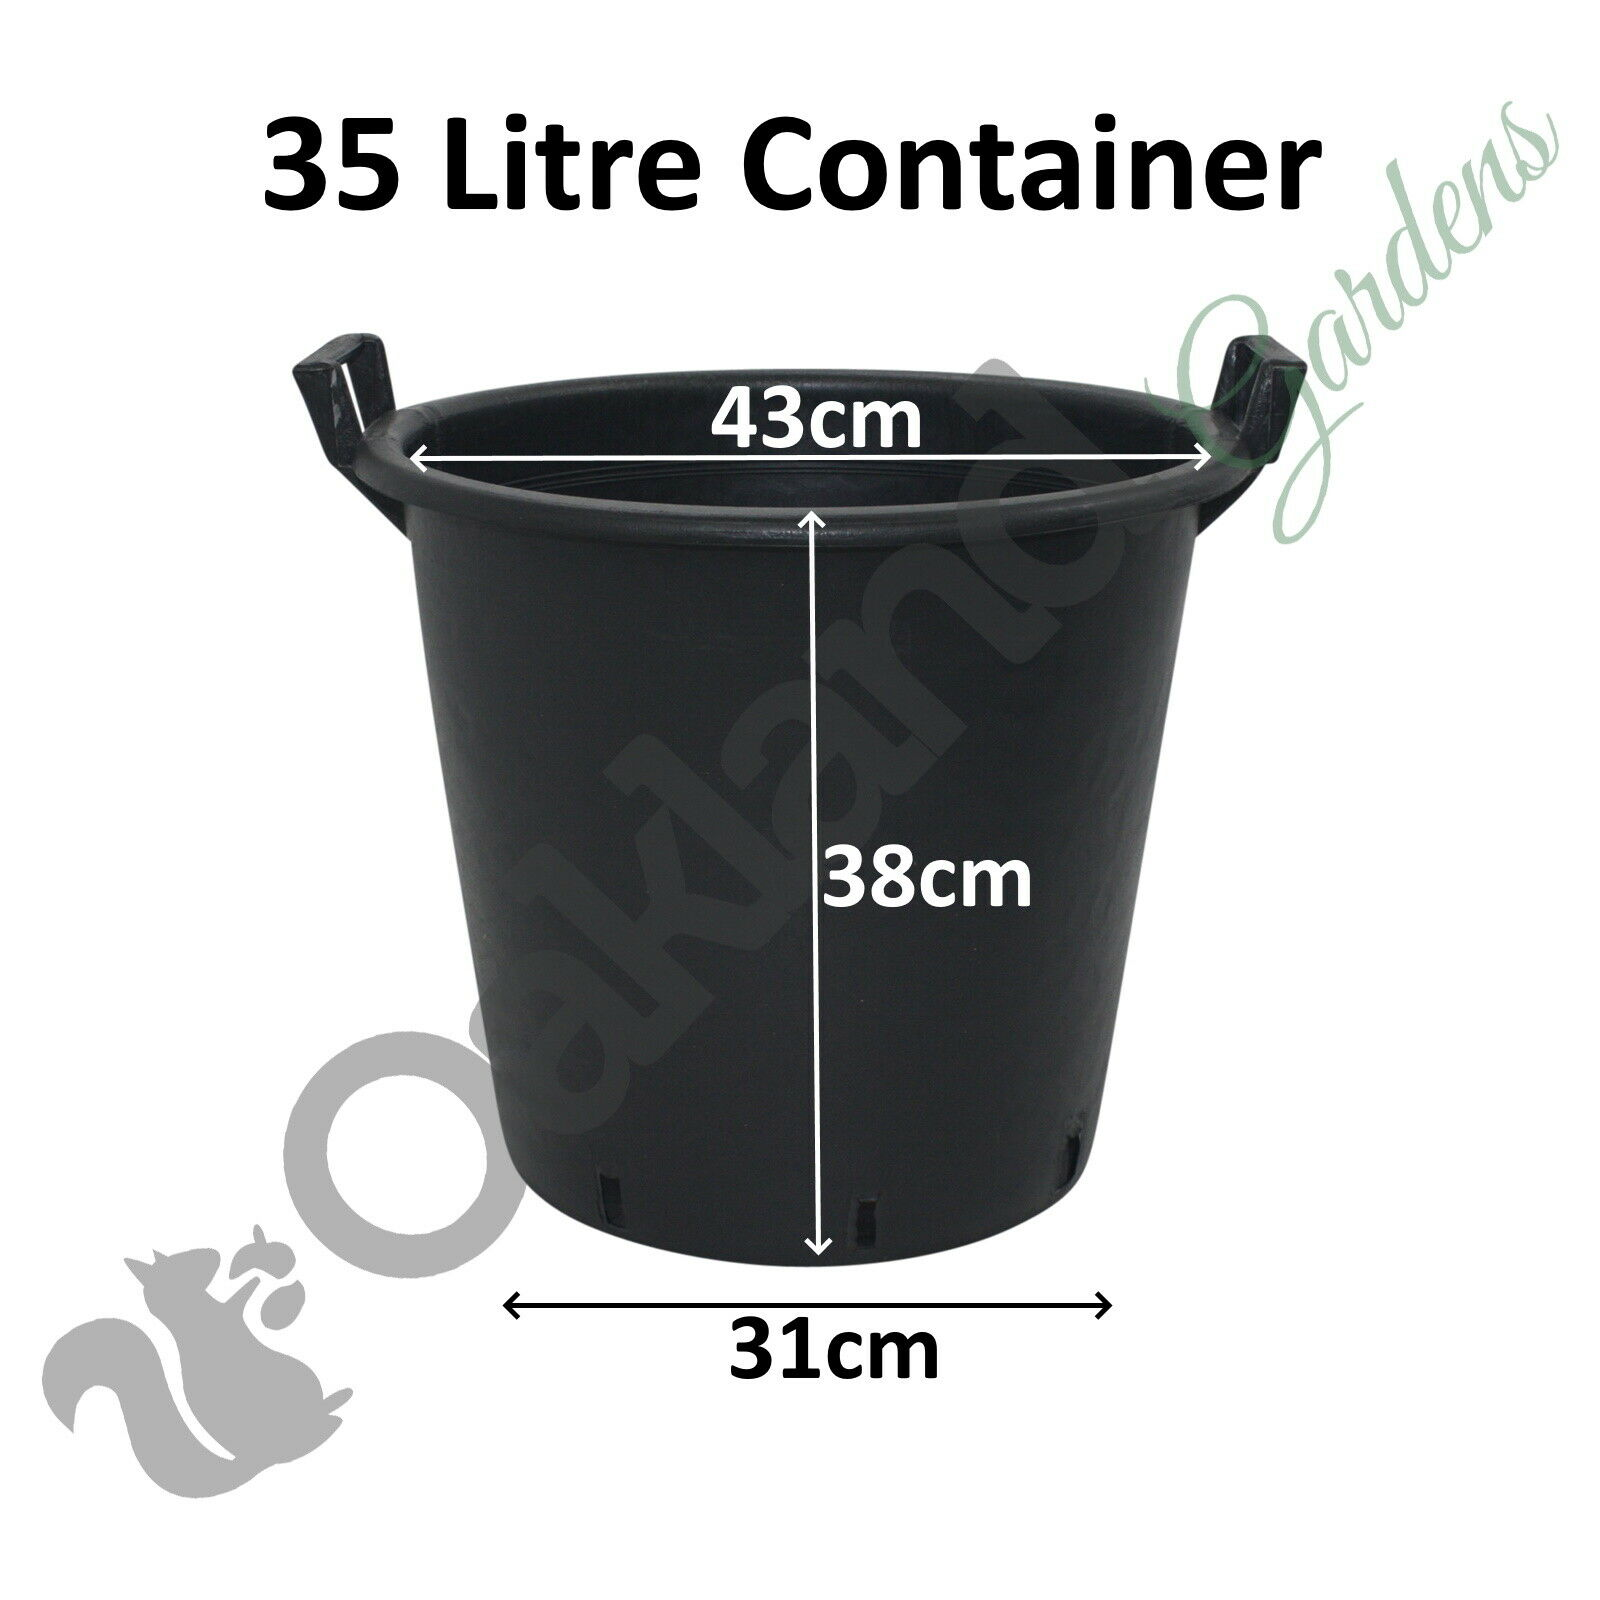 1 x 35 Litre Plant Tree Pot With Handles Heavy Duty 35L Lt Big Large Plastic